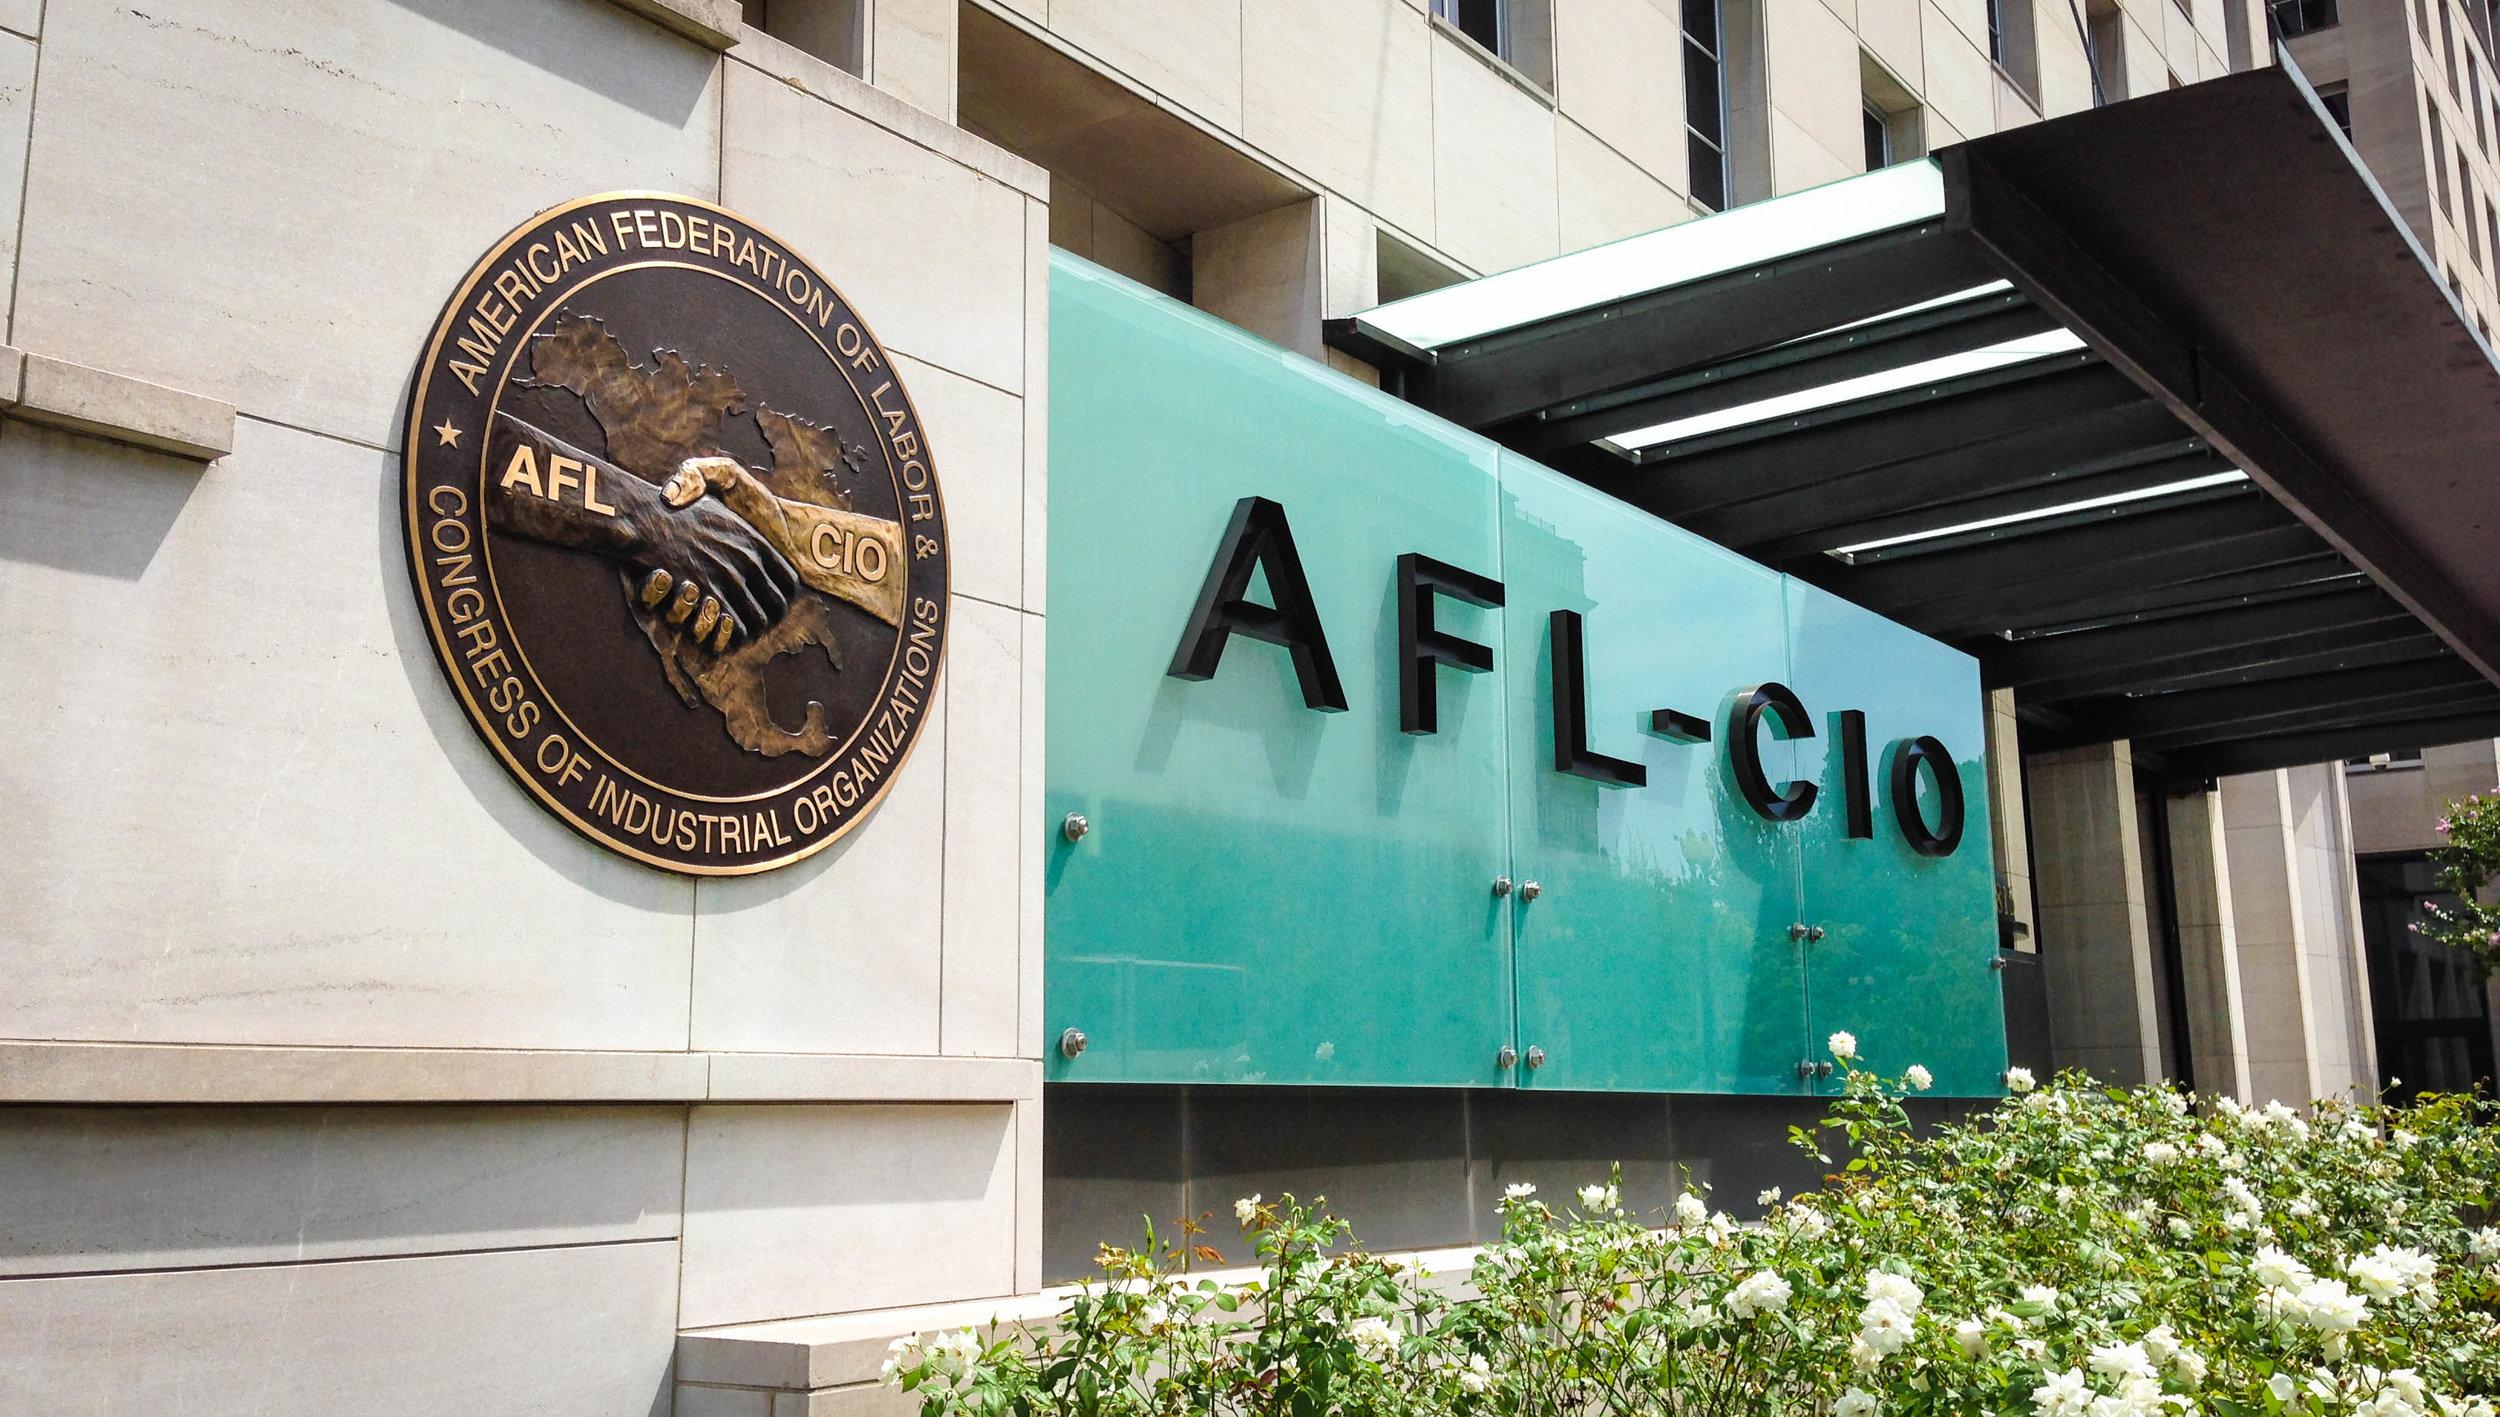 AFL-CIO_Headquarters,_Washington,_D.C.jpg